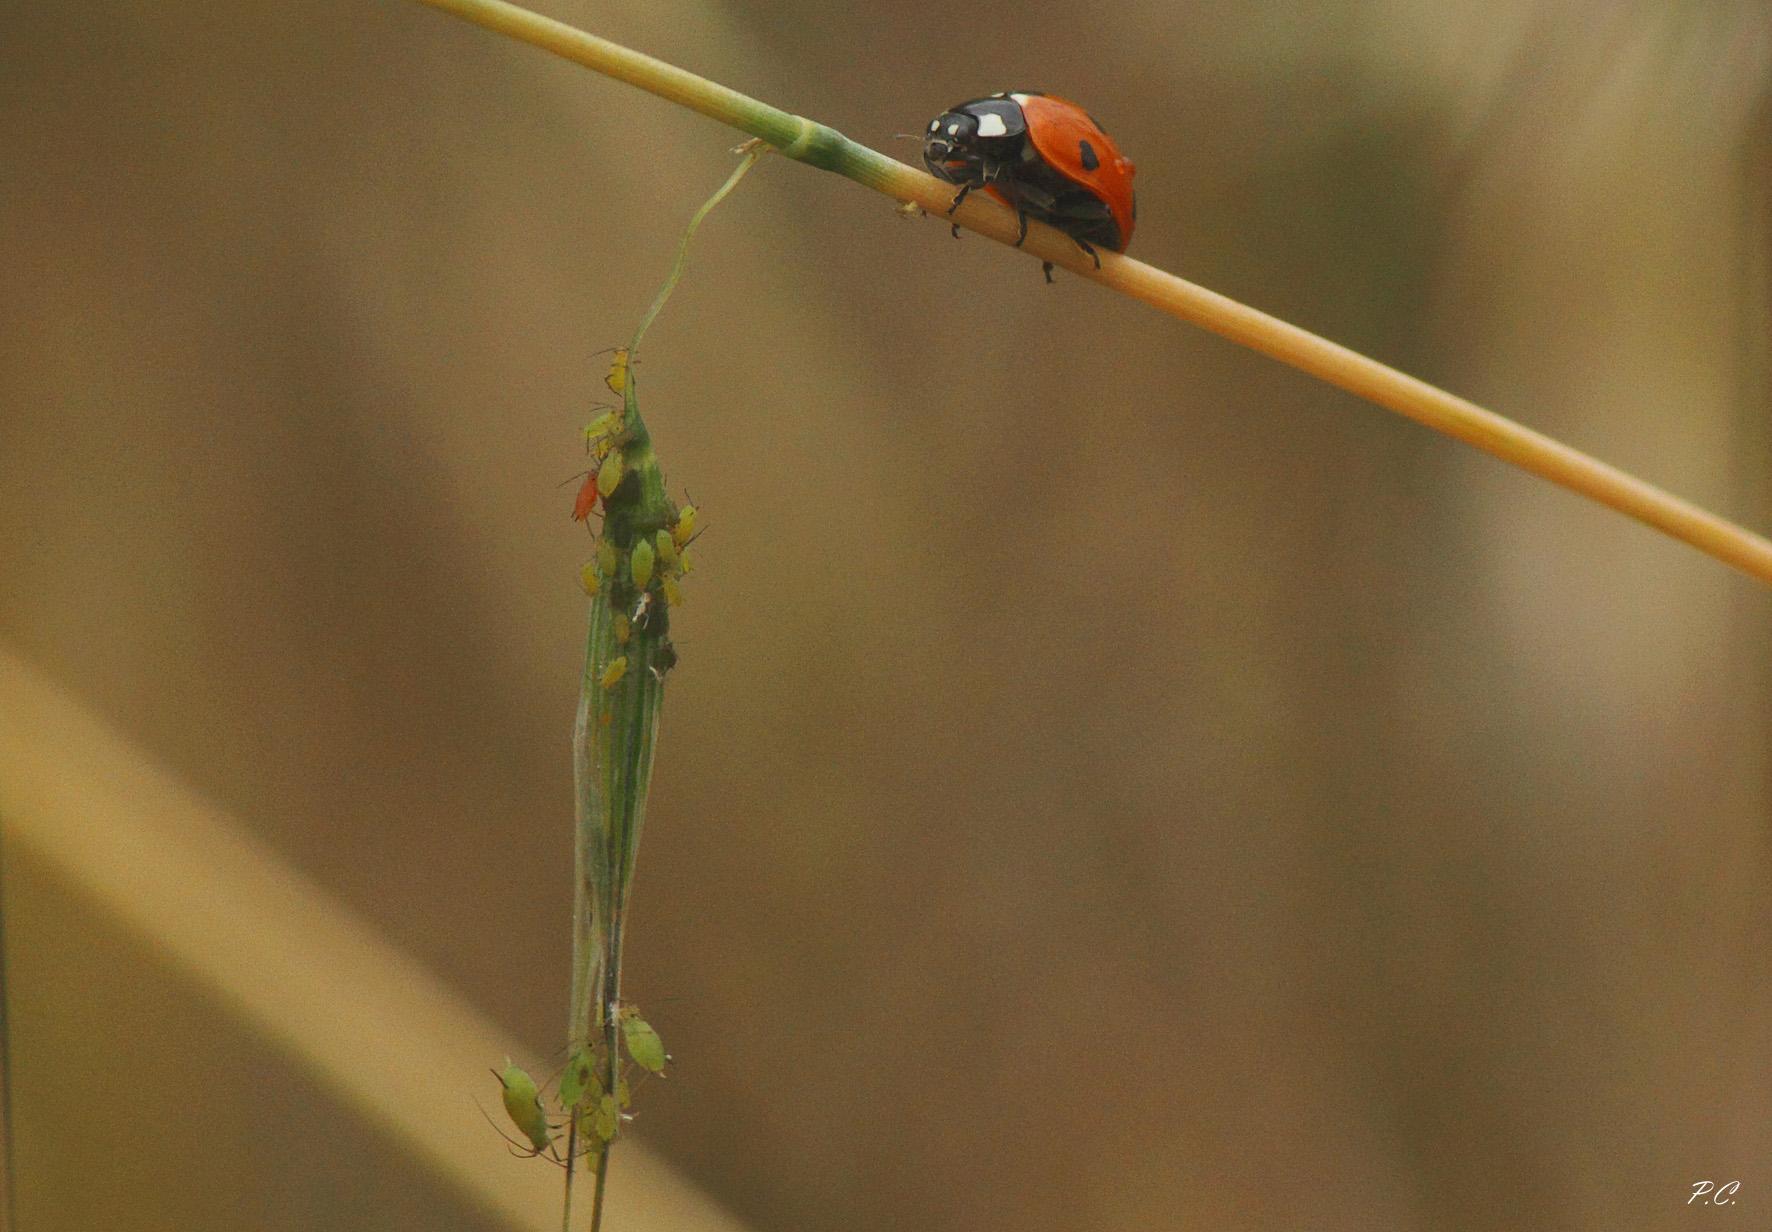 fisherwoman of aphids...